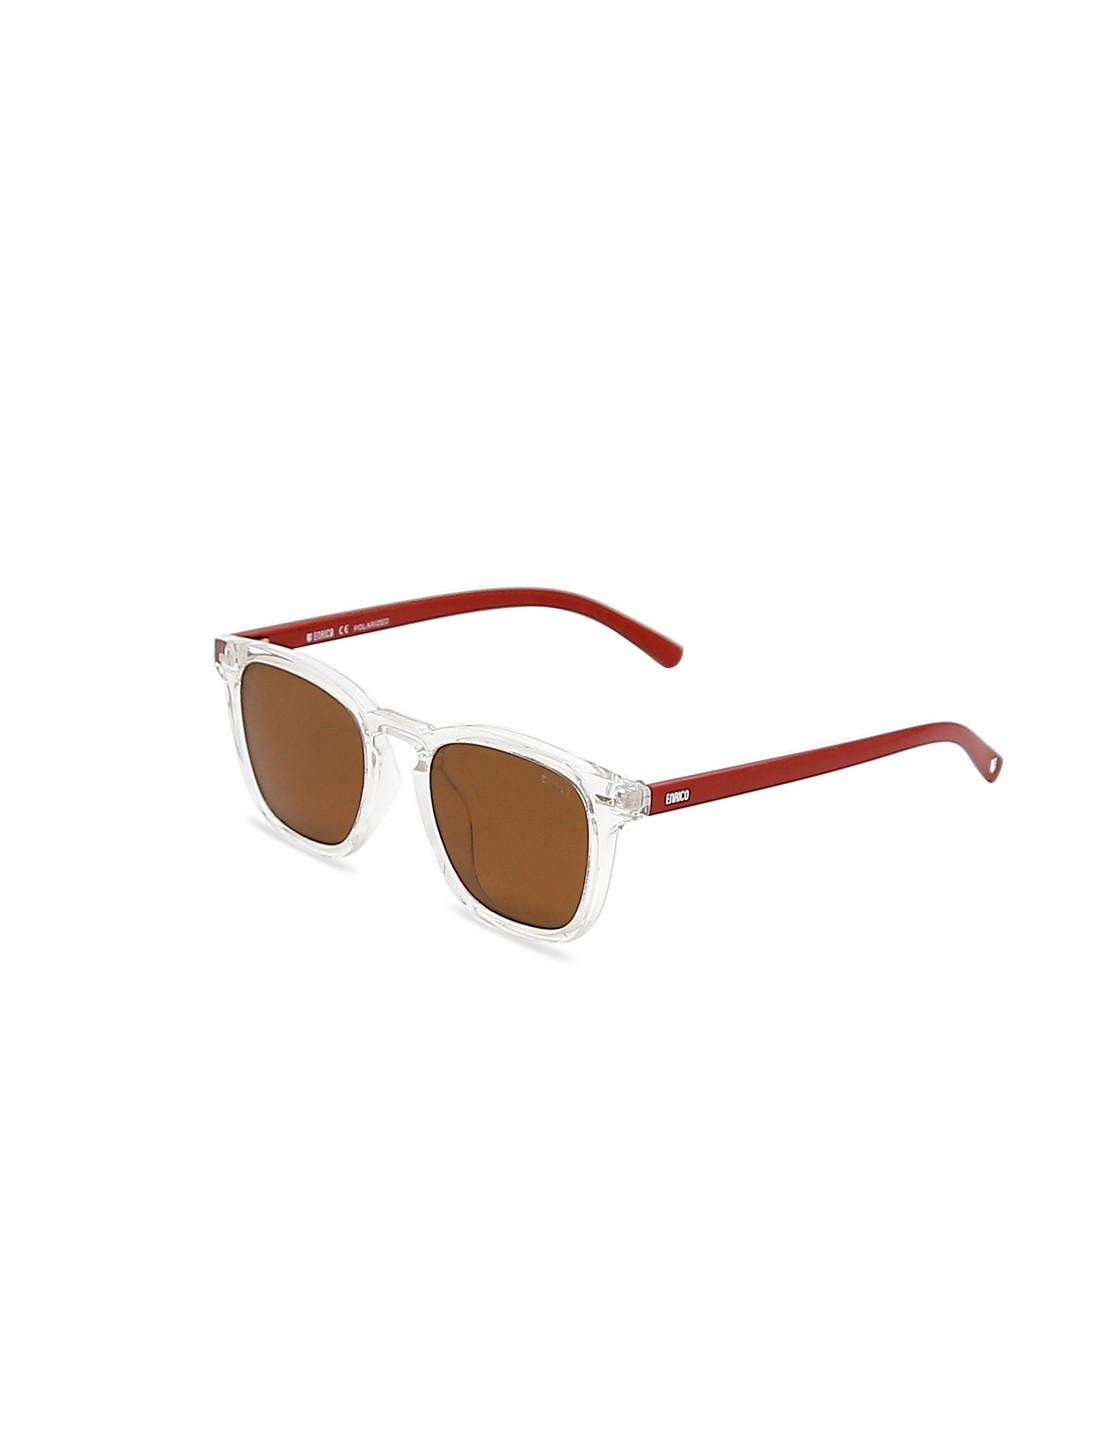 ENRICO   ENRICO Amanzi UV Protected Wayfarer Shape Unisex Sunglasses ( Lens - Orange   Frame - Transparent / Brown)